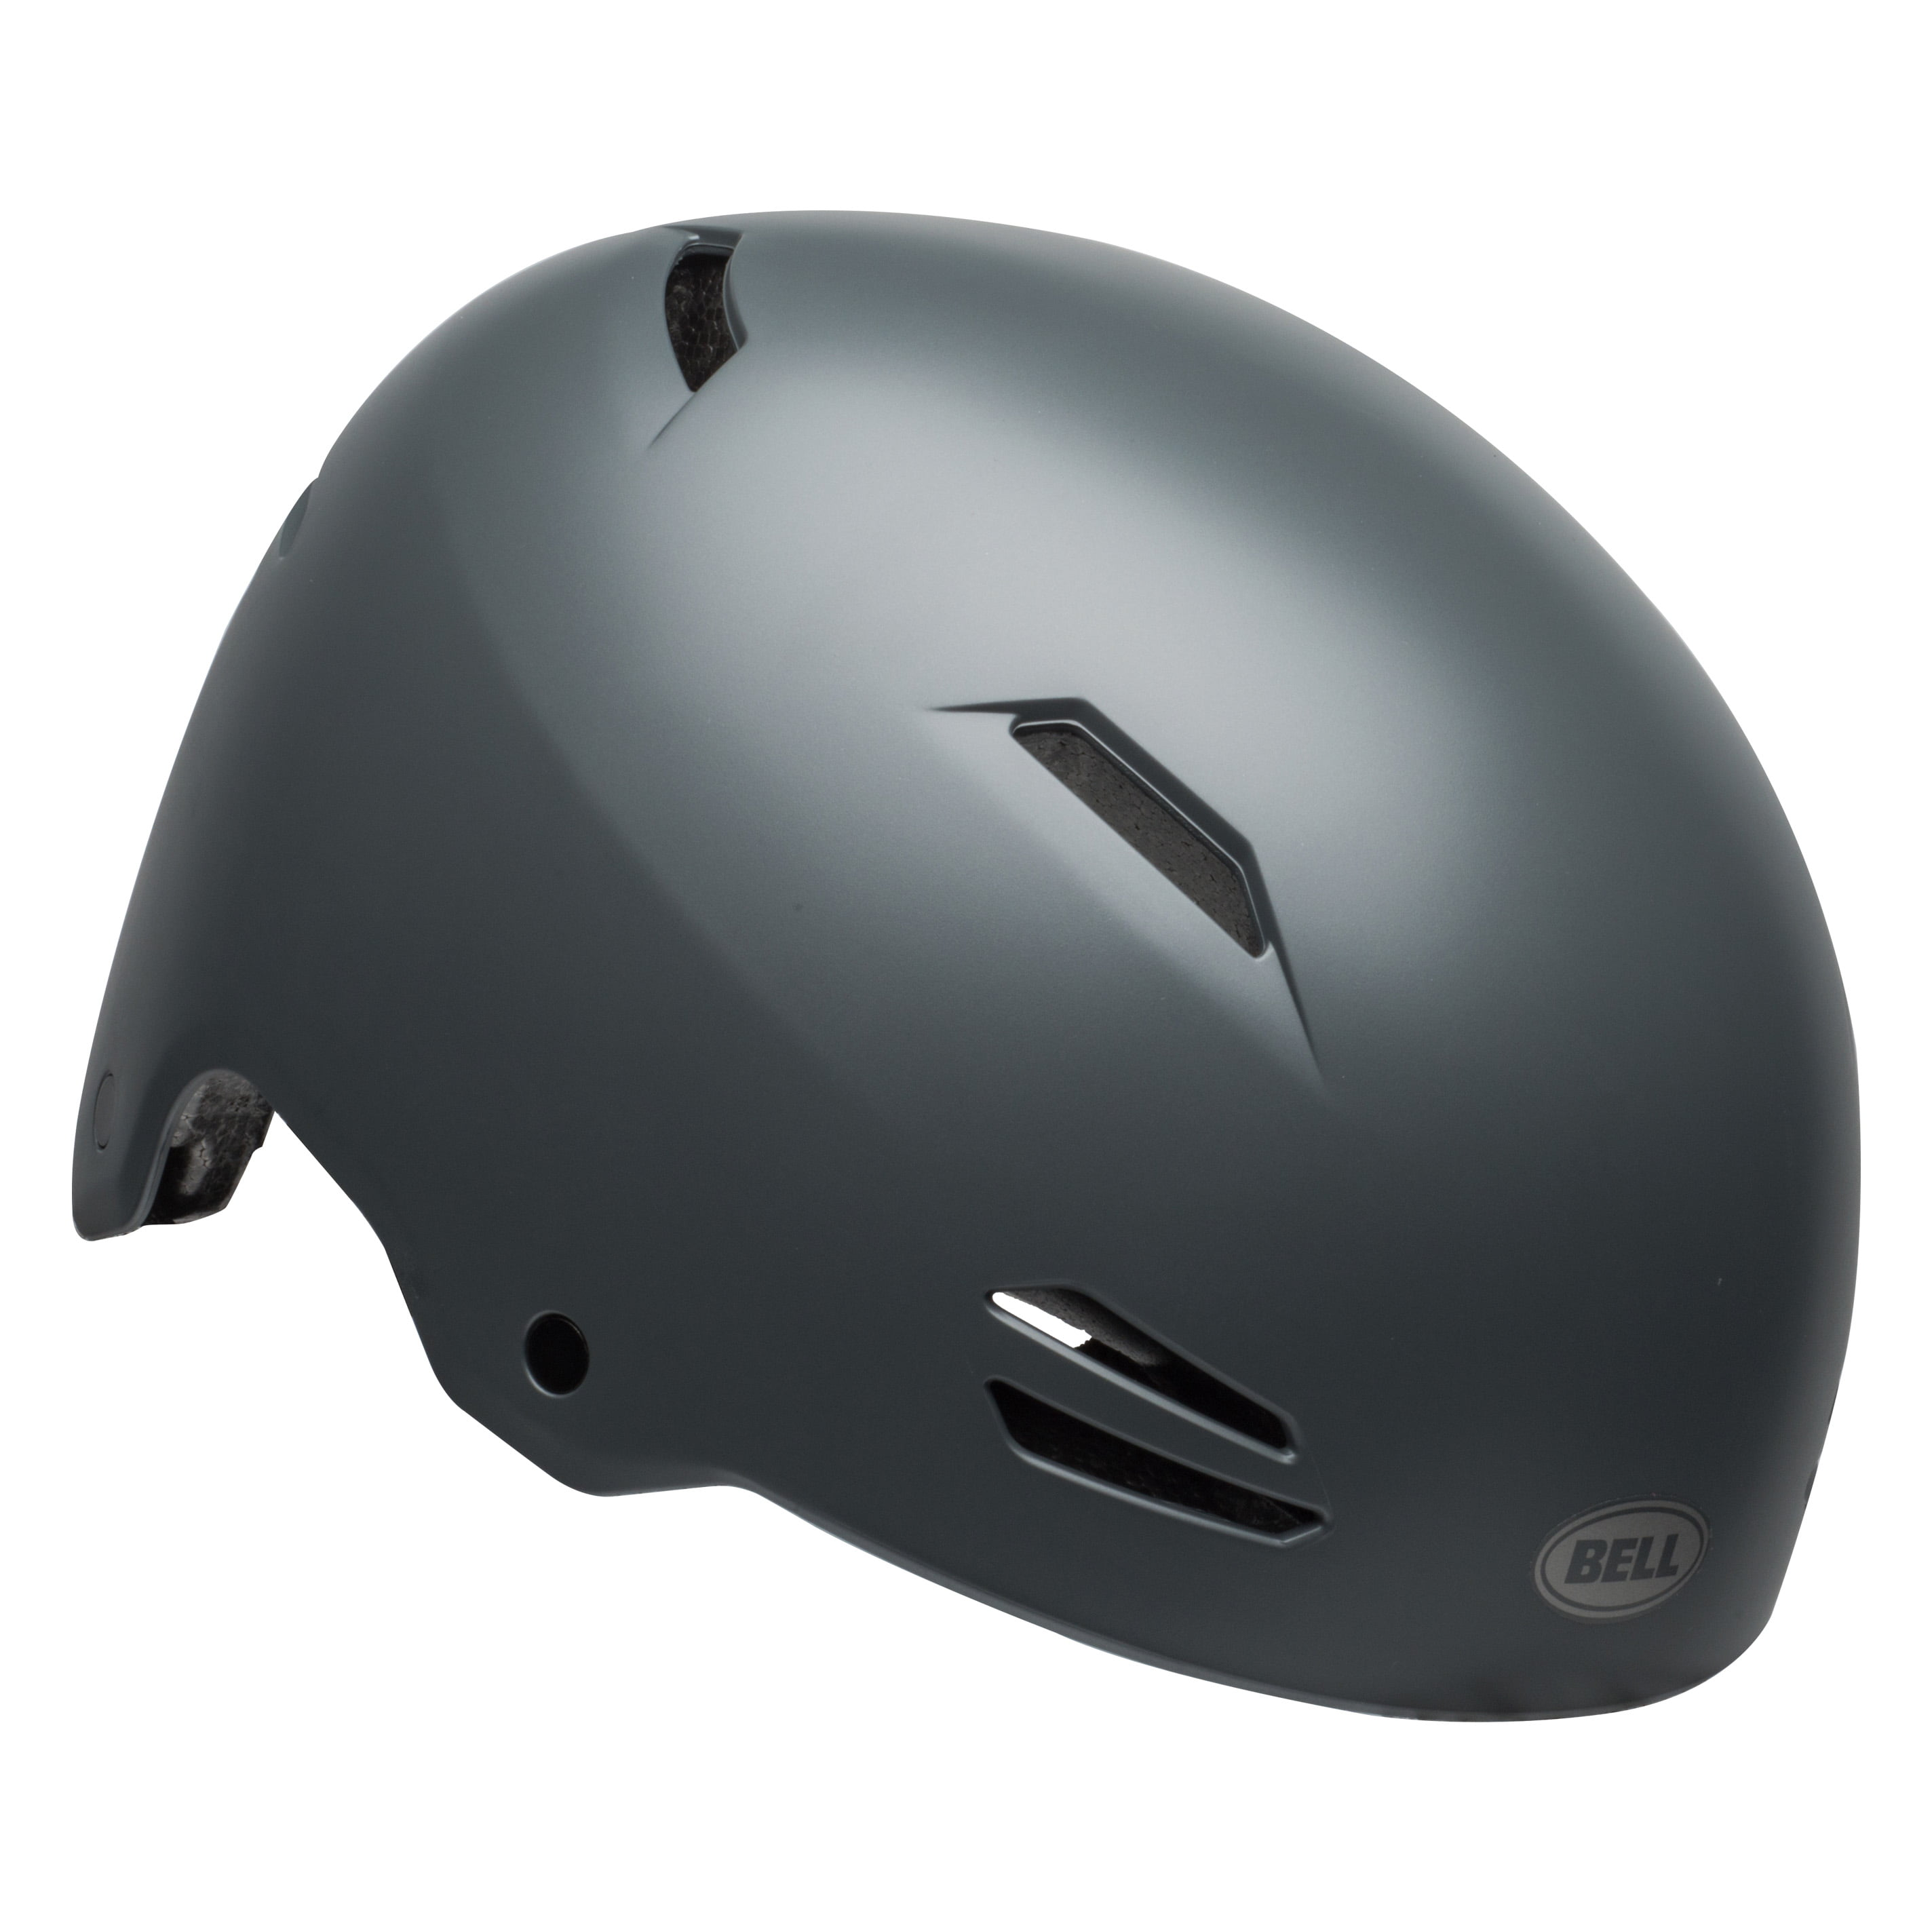 Bell Sports Vert 2.0 Adult Multisport Helmet, Dark Titanium by Vista Outdoor